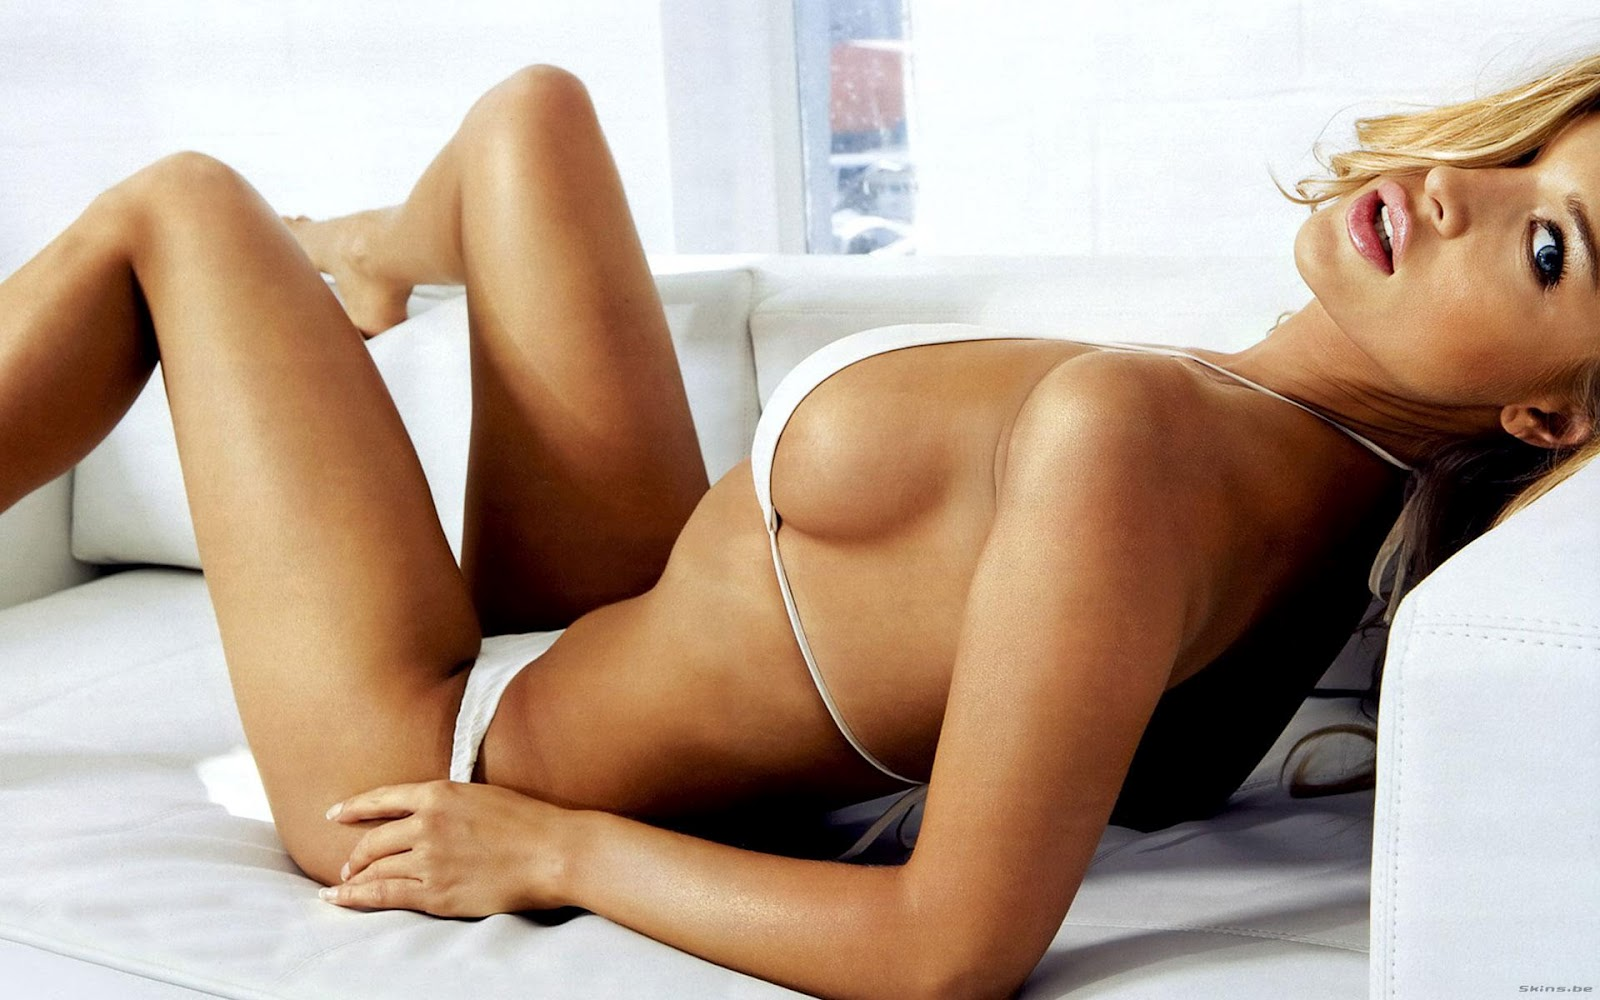 Joanna Krupa É Uma Polaca Deliciosa